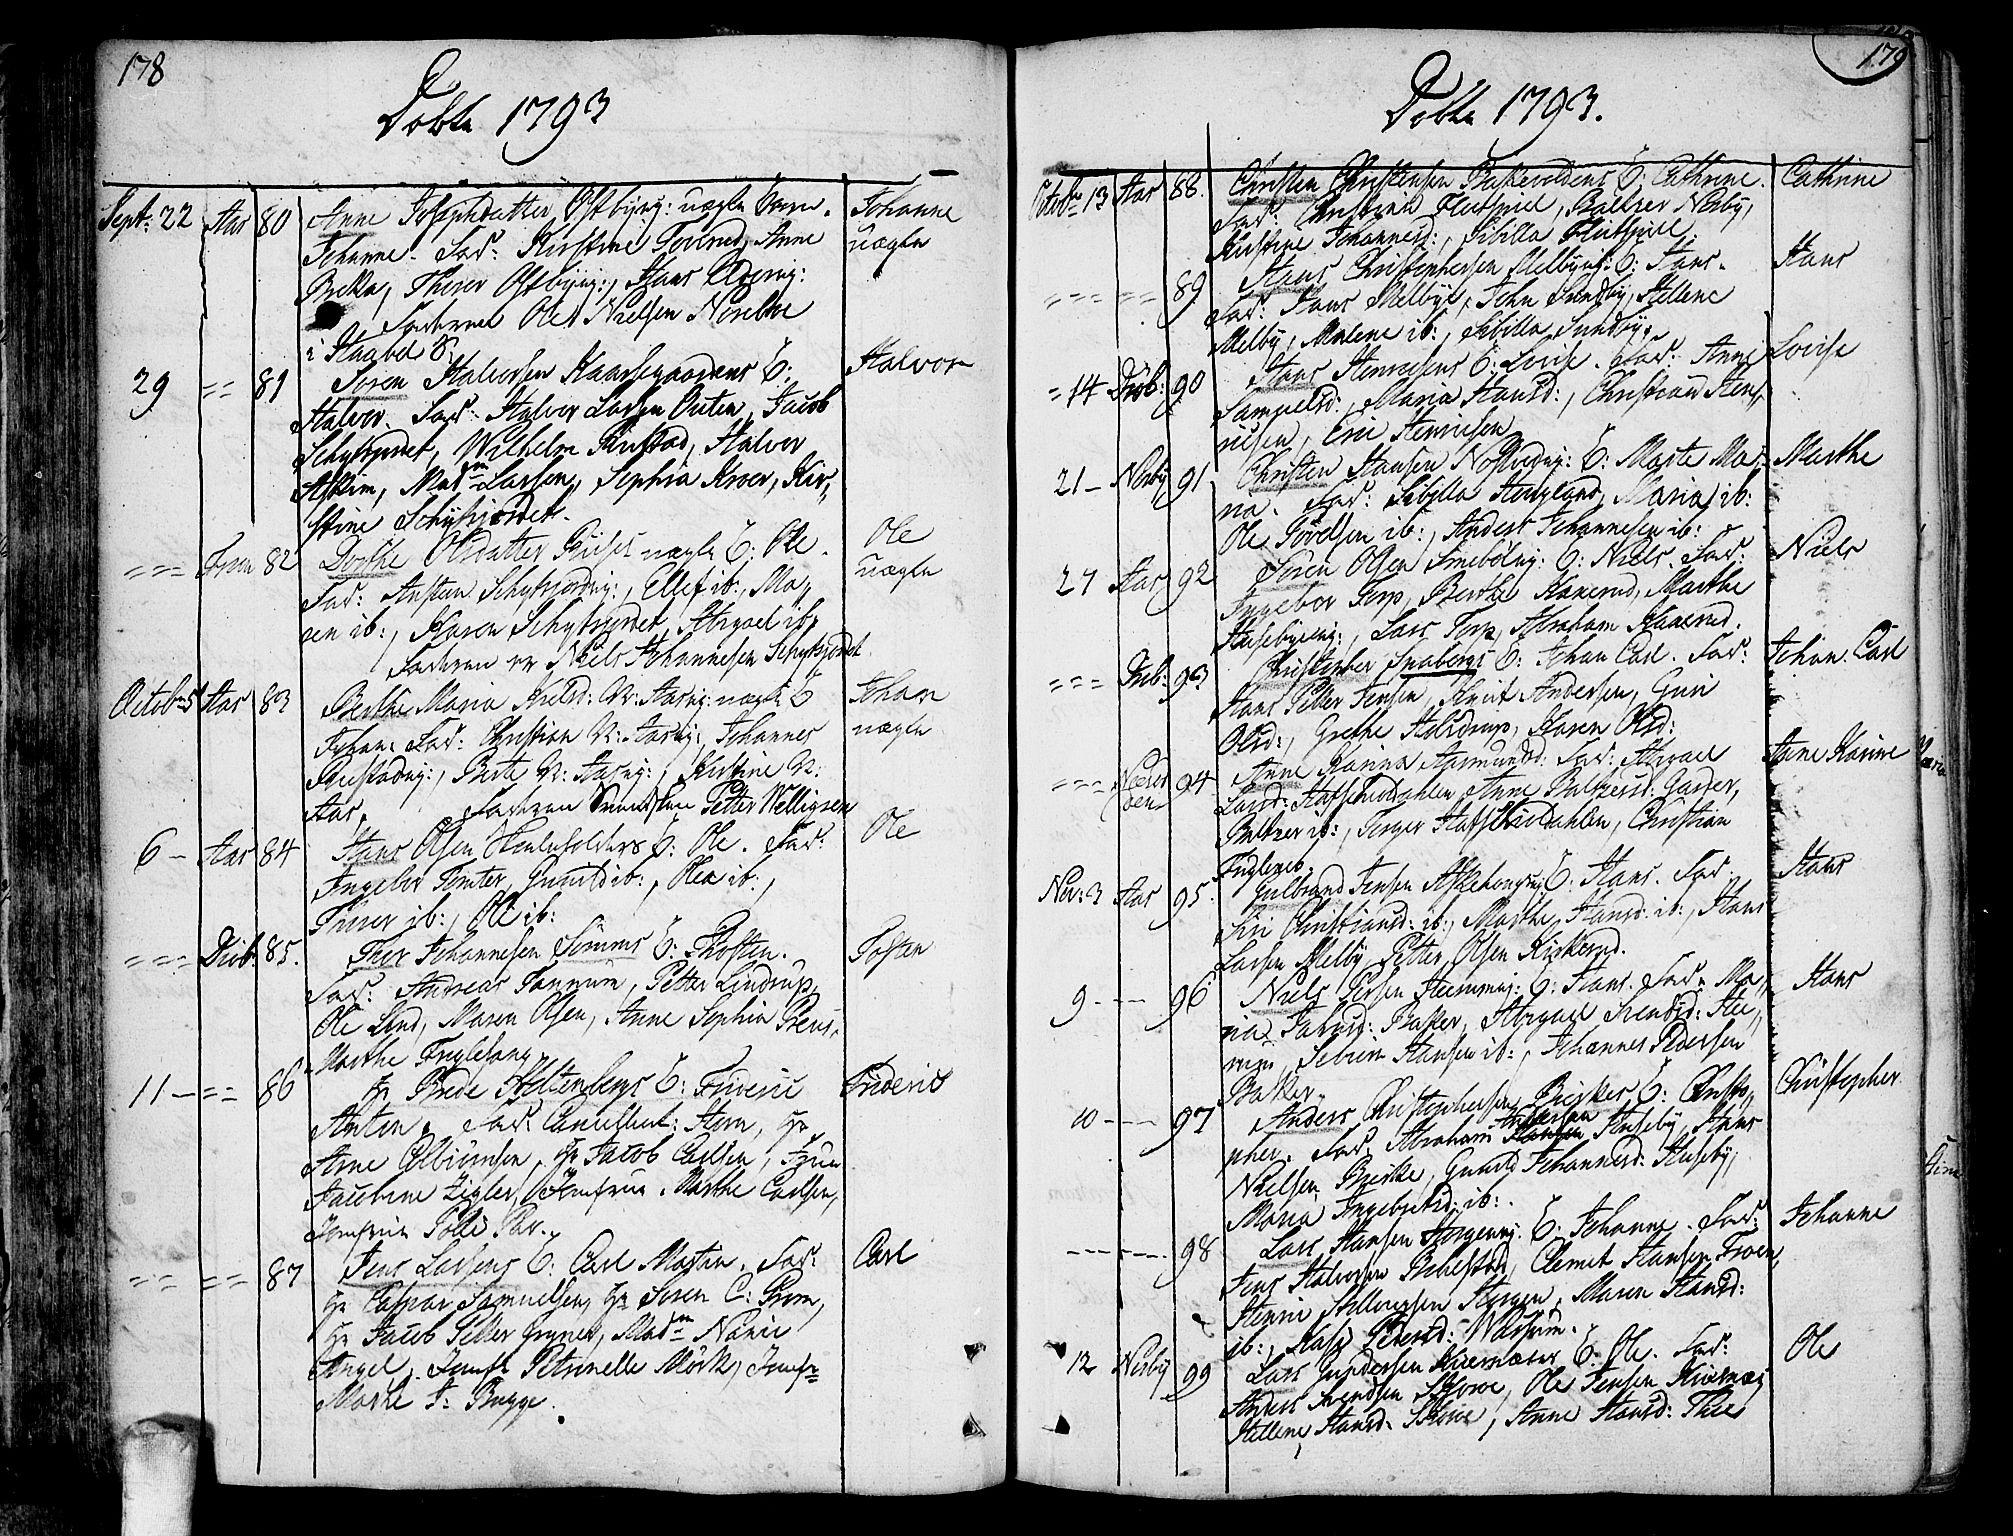 SAO, Ås prestekontor Kirkebøker, F/Fa/L0002: Ministerialbok nr. I 2, 1778-1813, s. 178-179